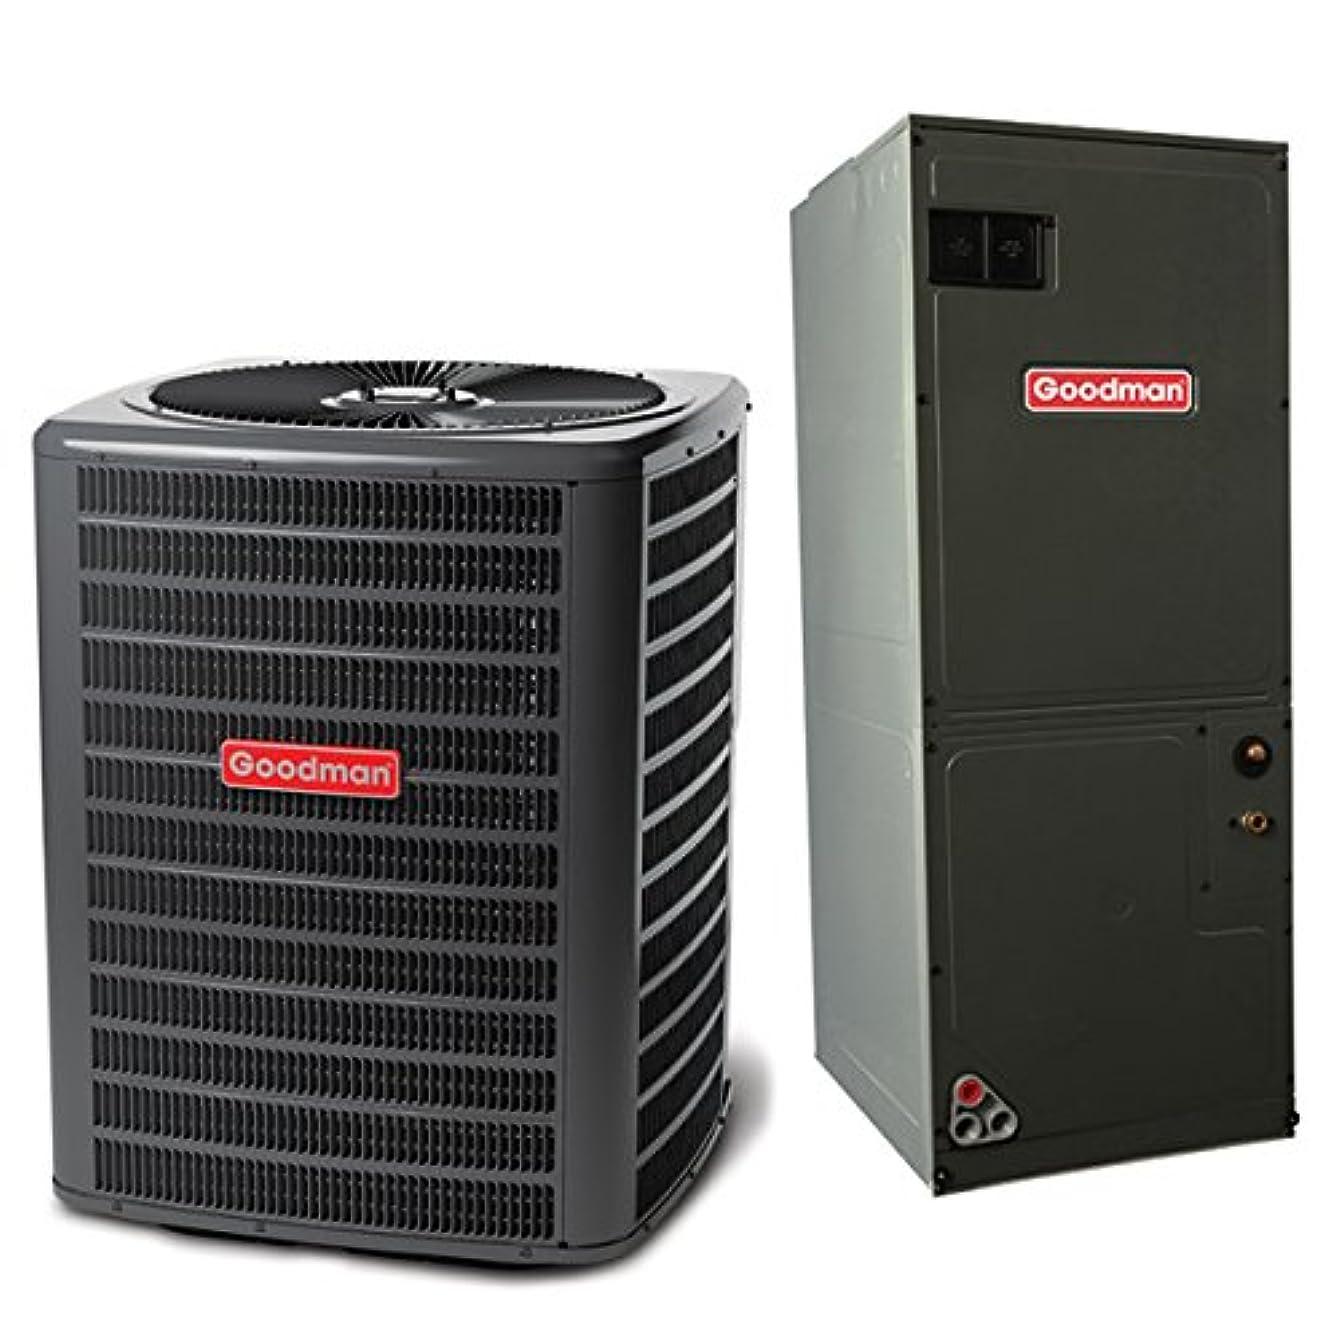 Goodman 3 Ton 13 SEER Multi Speed Central Air Conditioner Split System - Multiposition